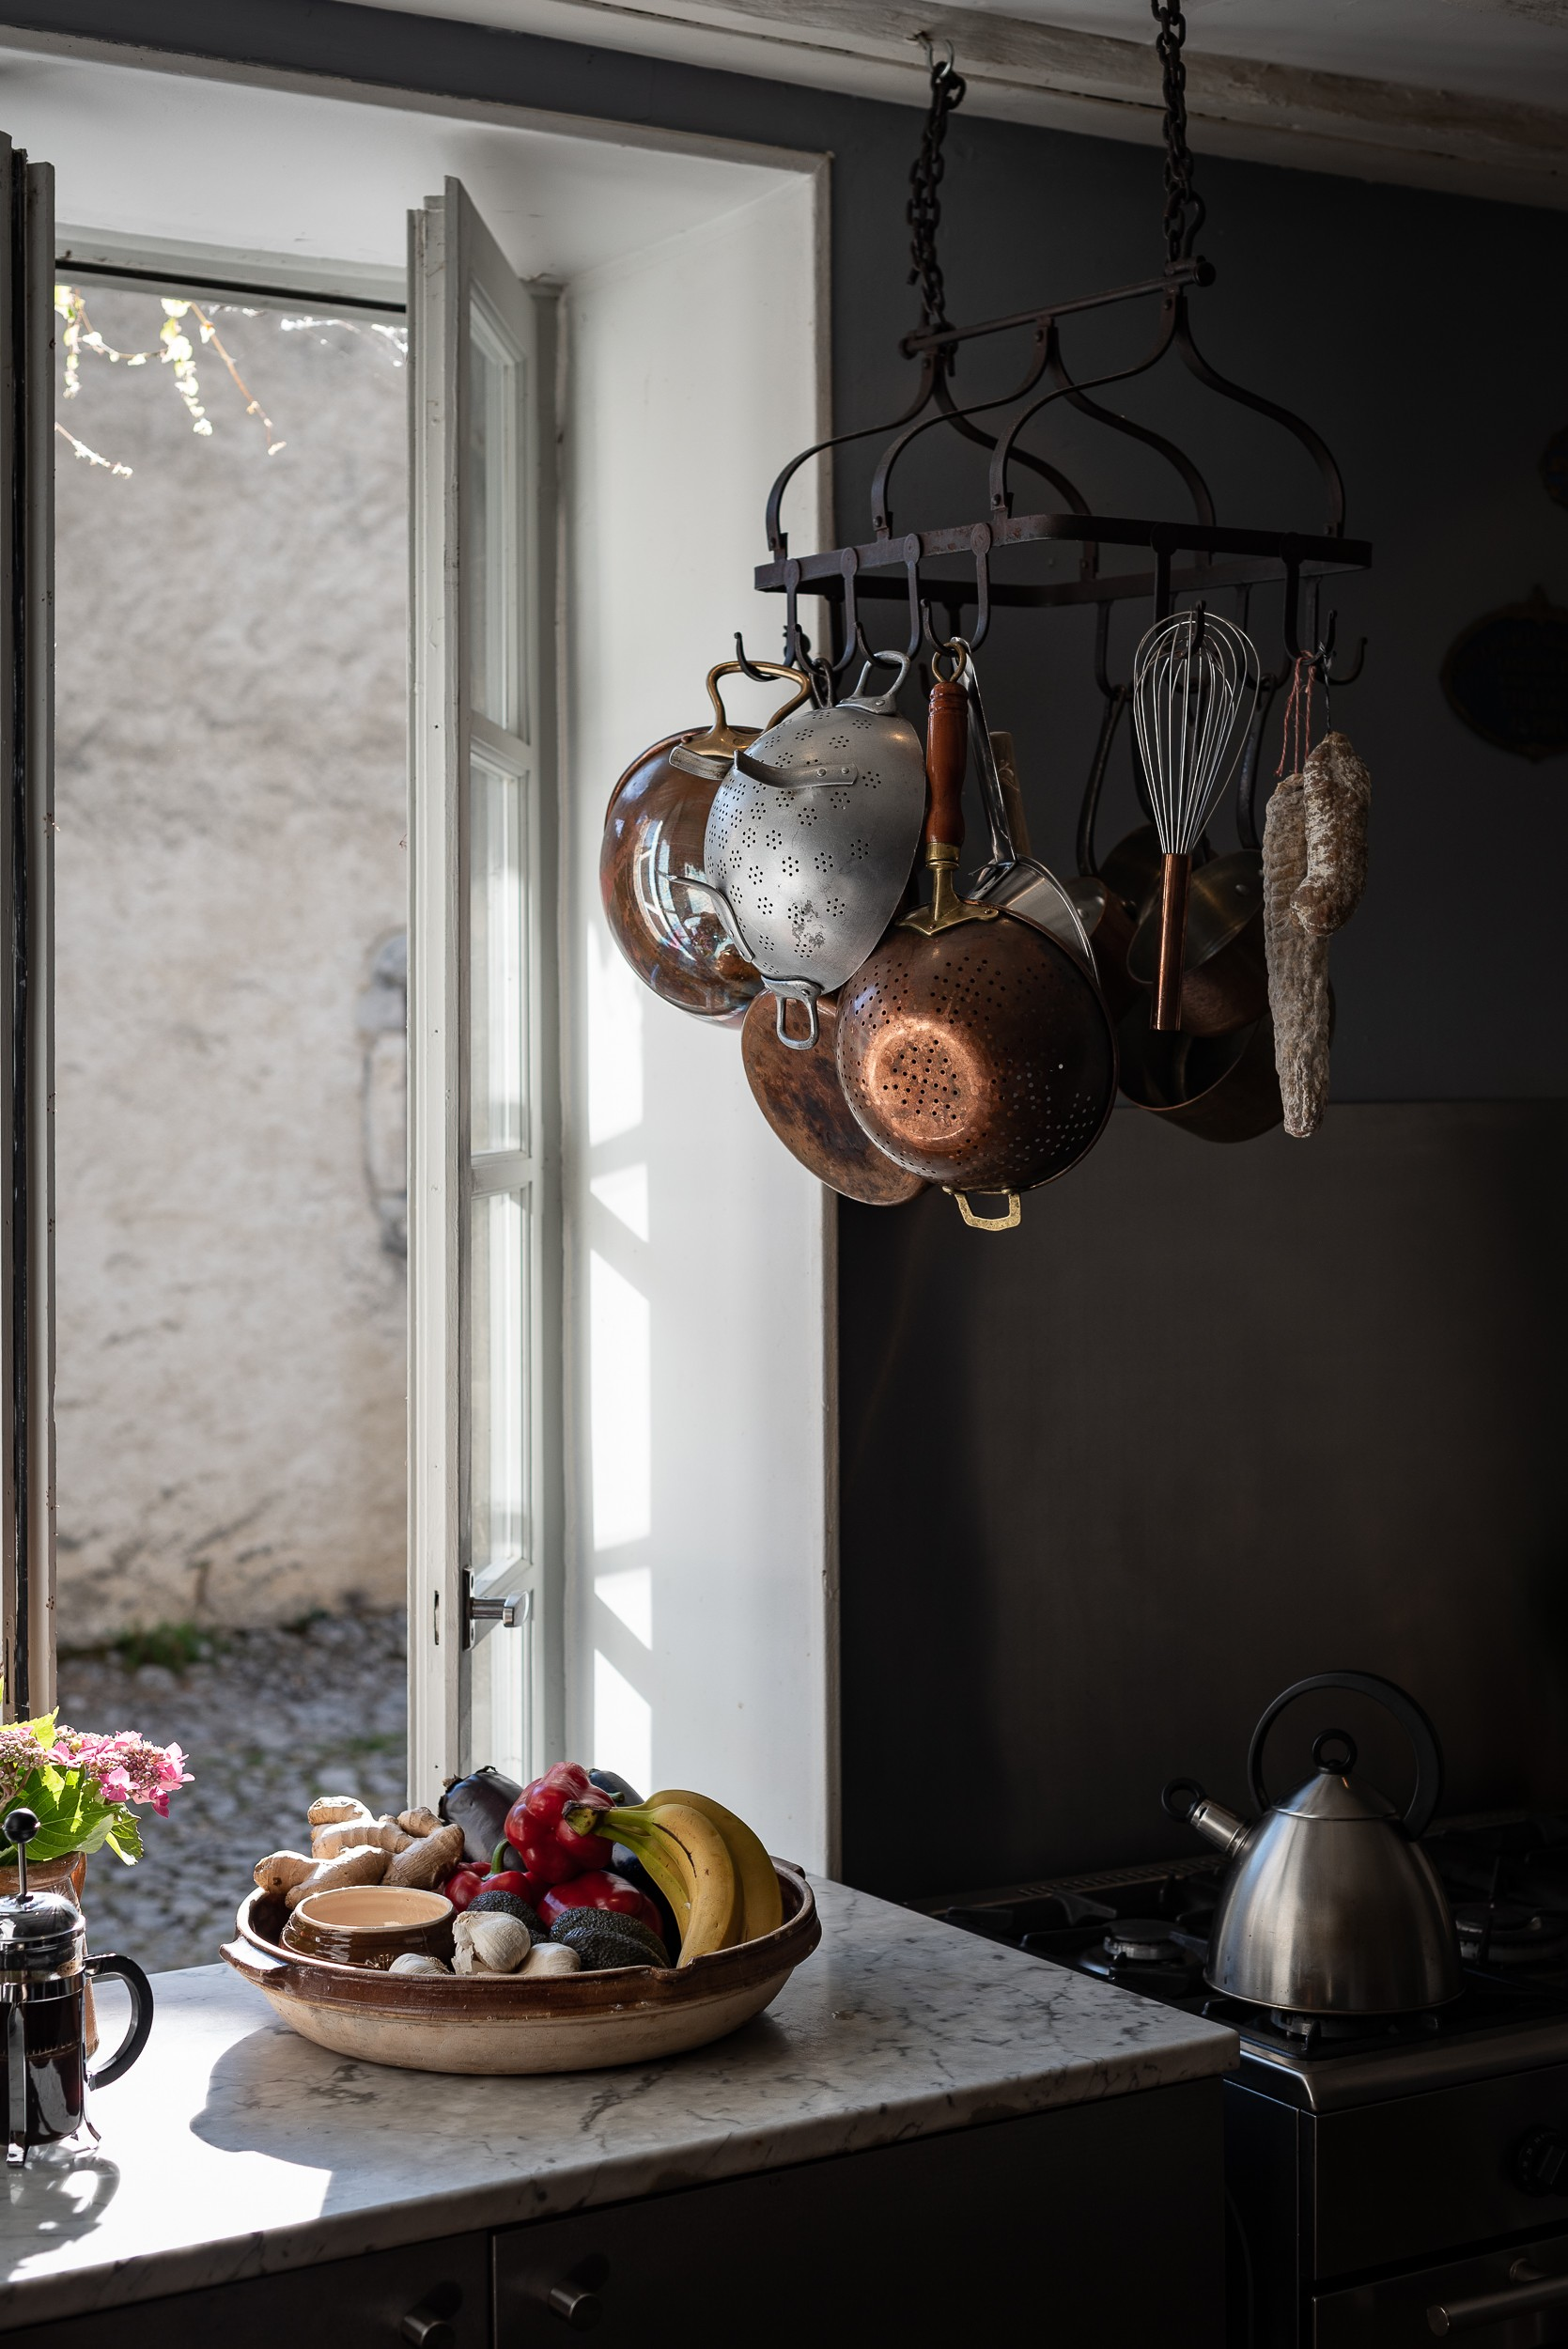 Adventures in Food, Charroux cook's tour